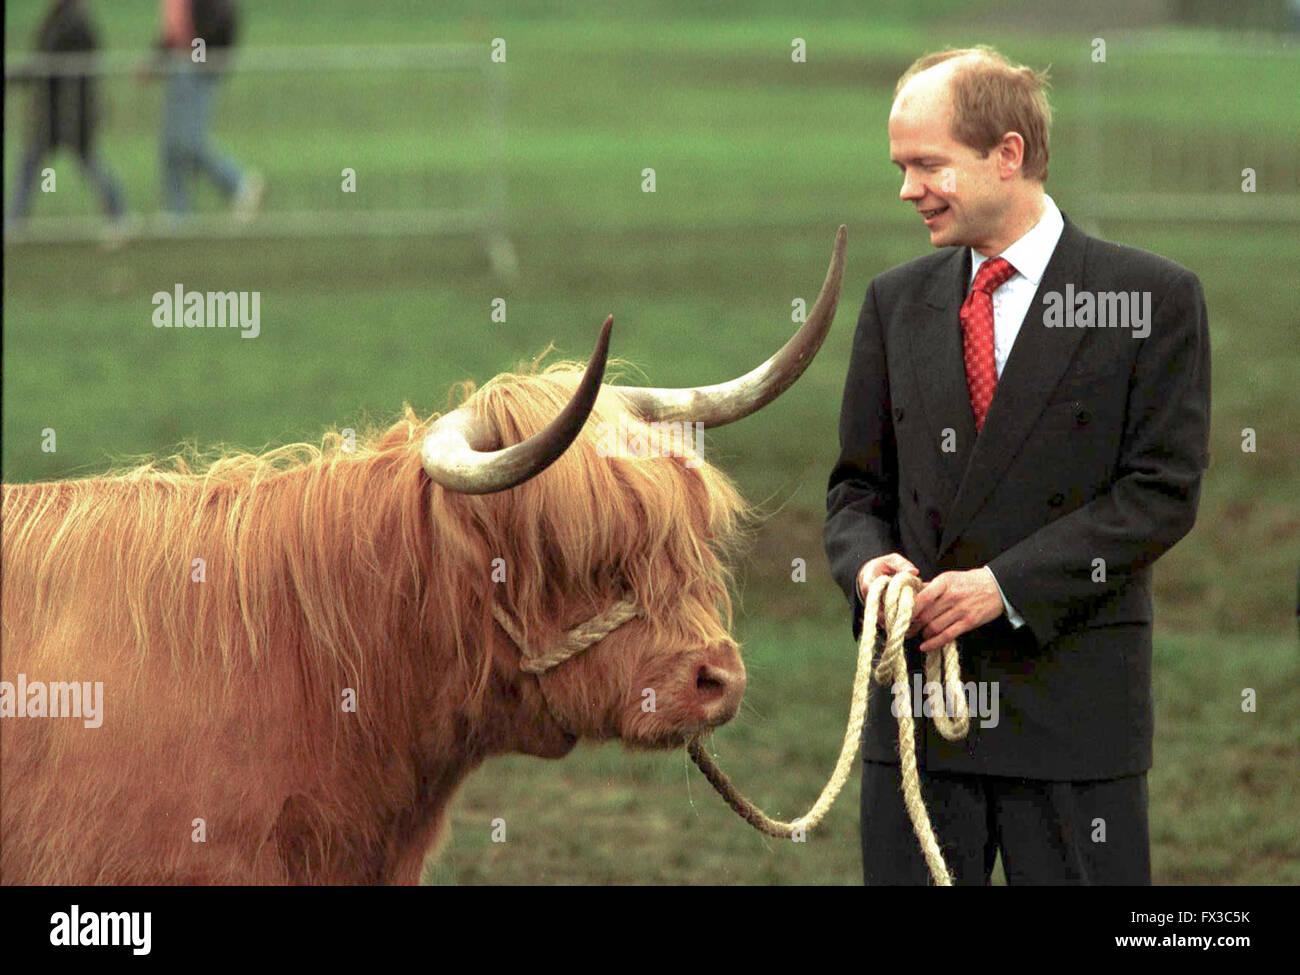 Tory leader William Haig visits the Royal Highland Show at Ingliston, Edinburgh - Stock Image